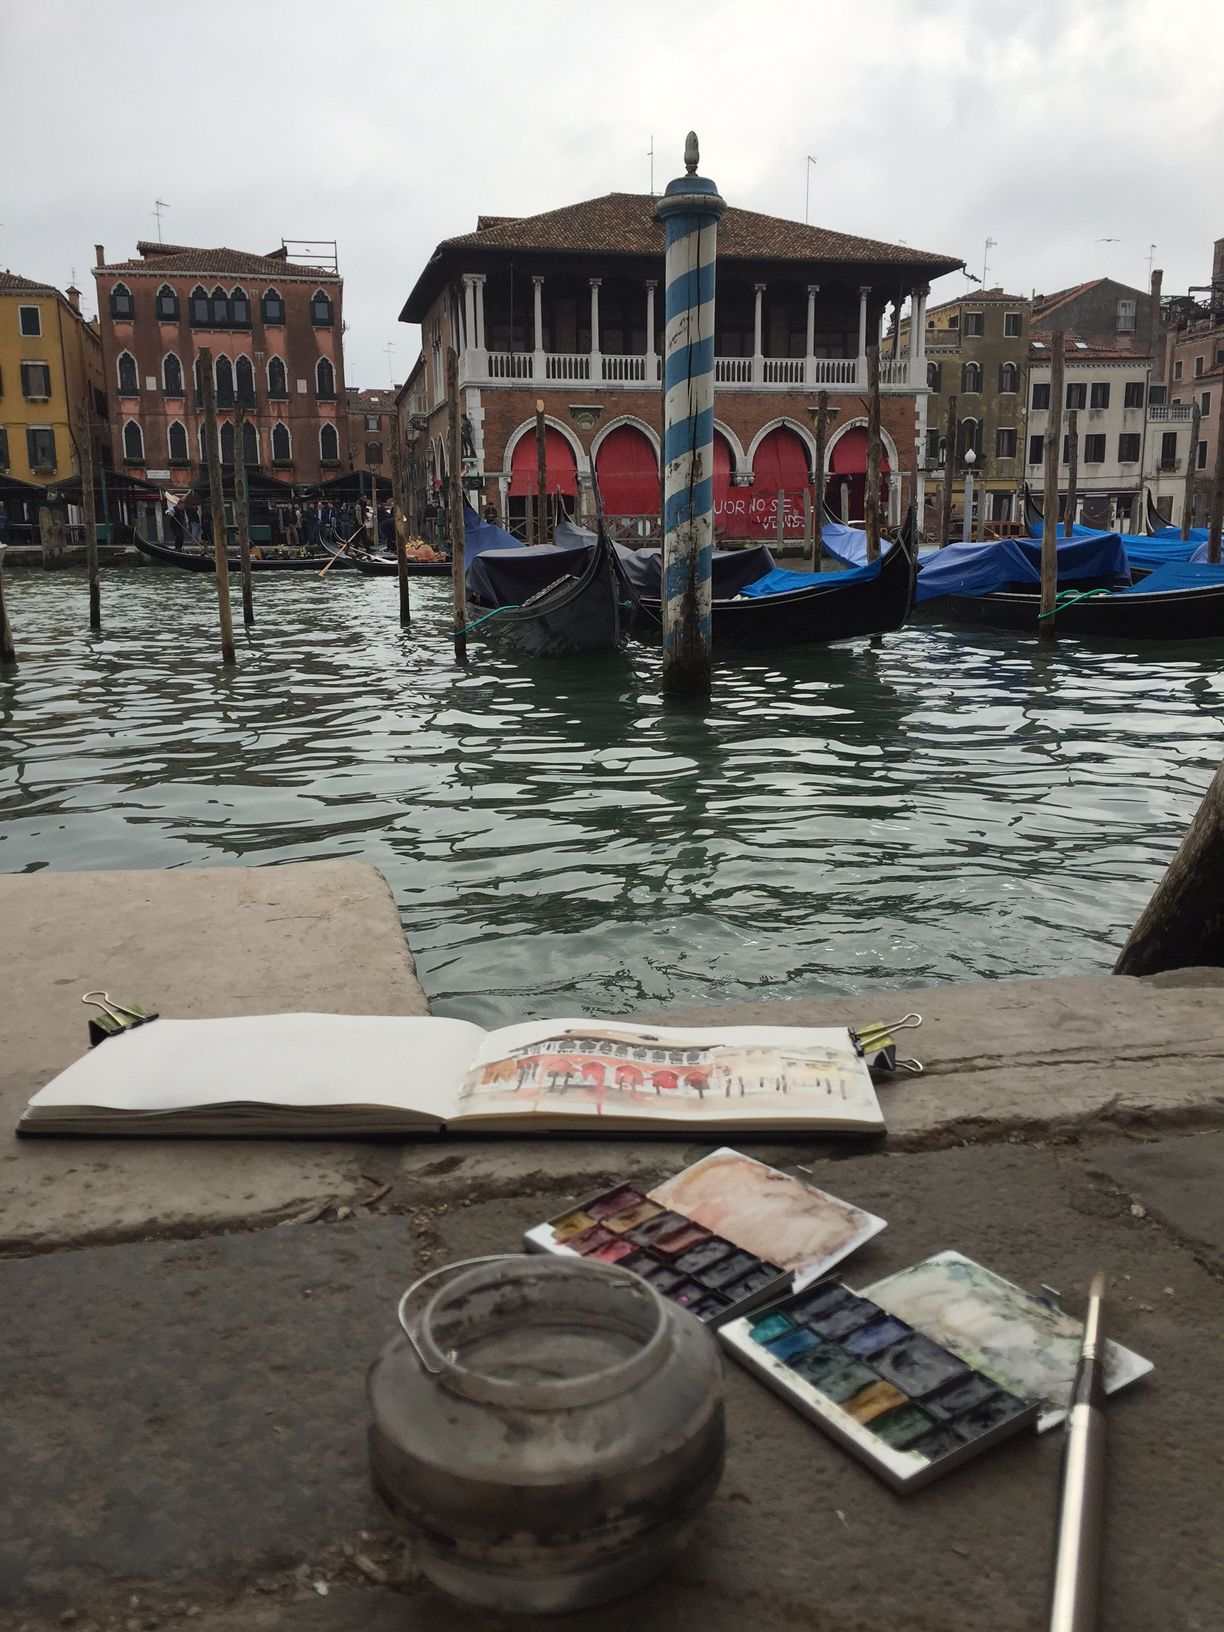 My Venezia Moleskine only travels to Venezia